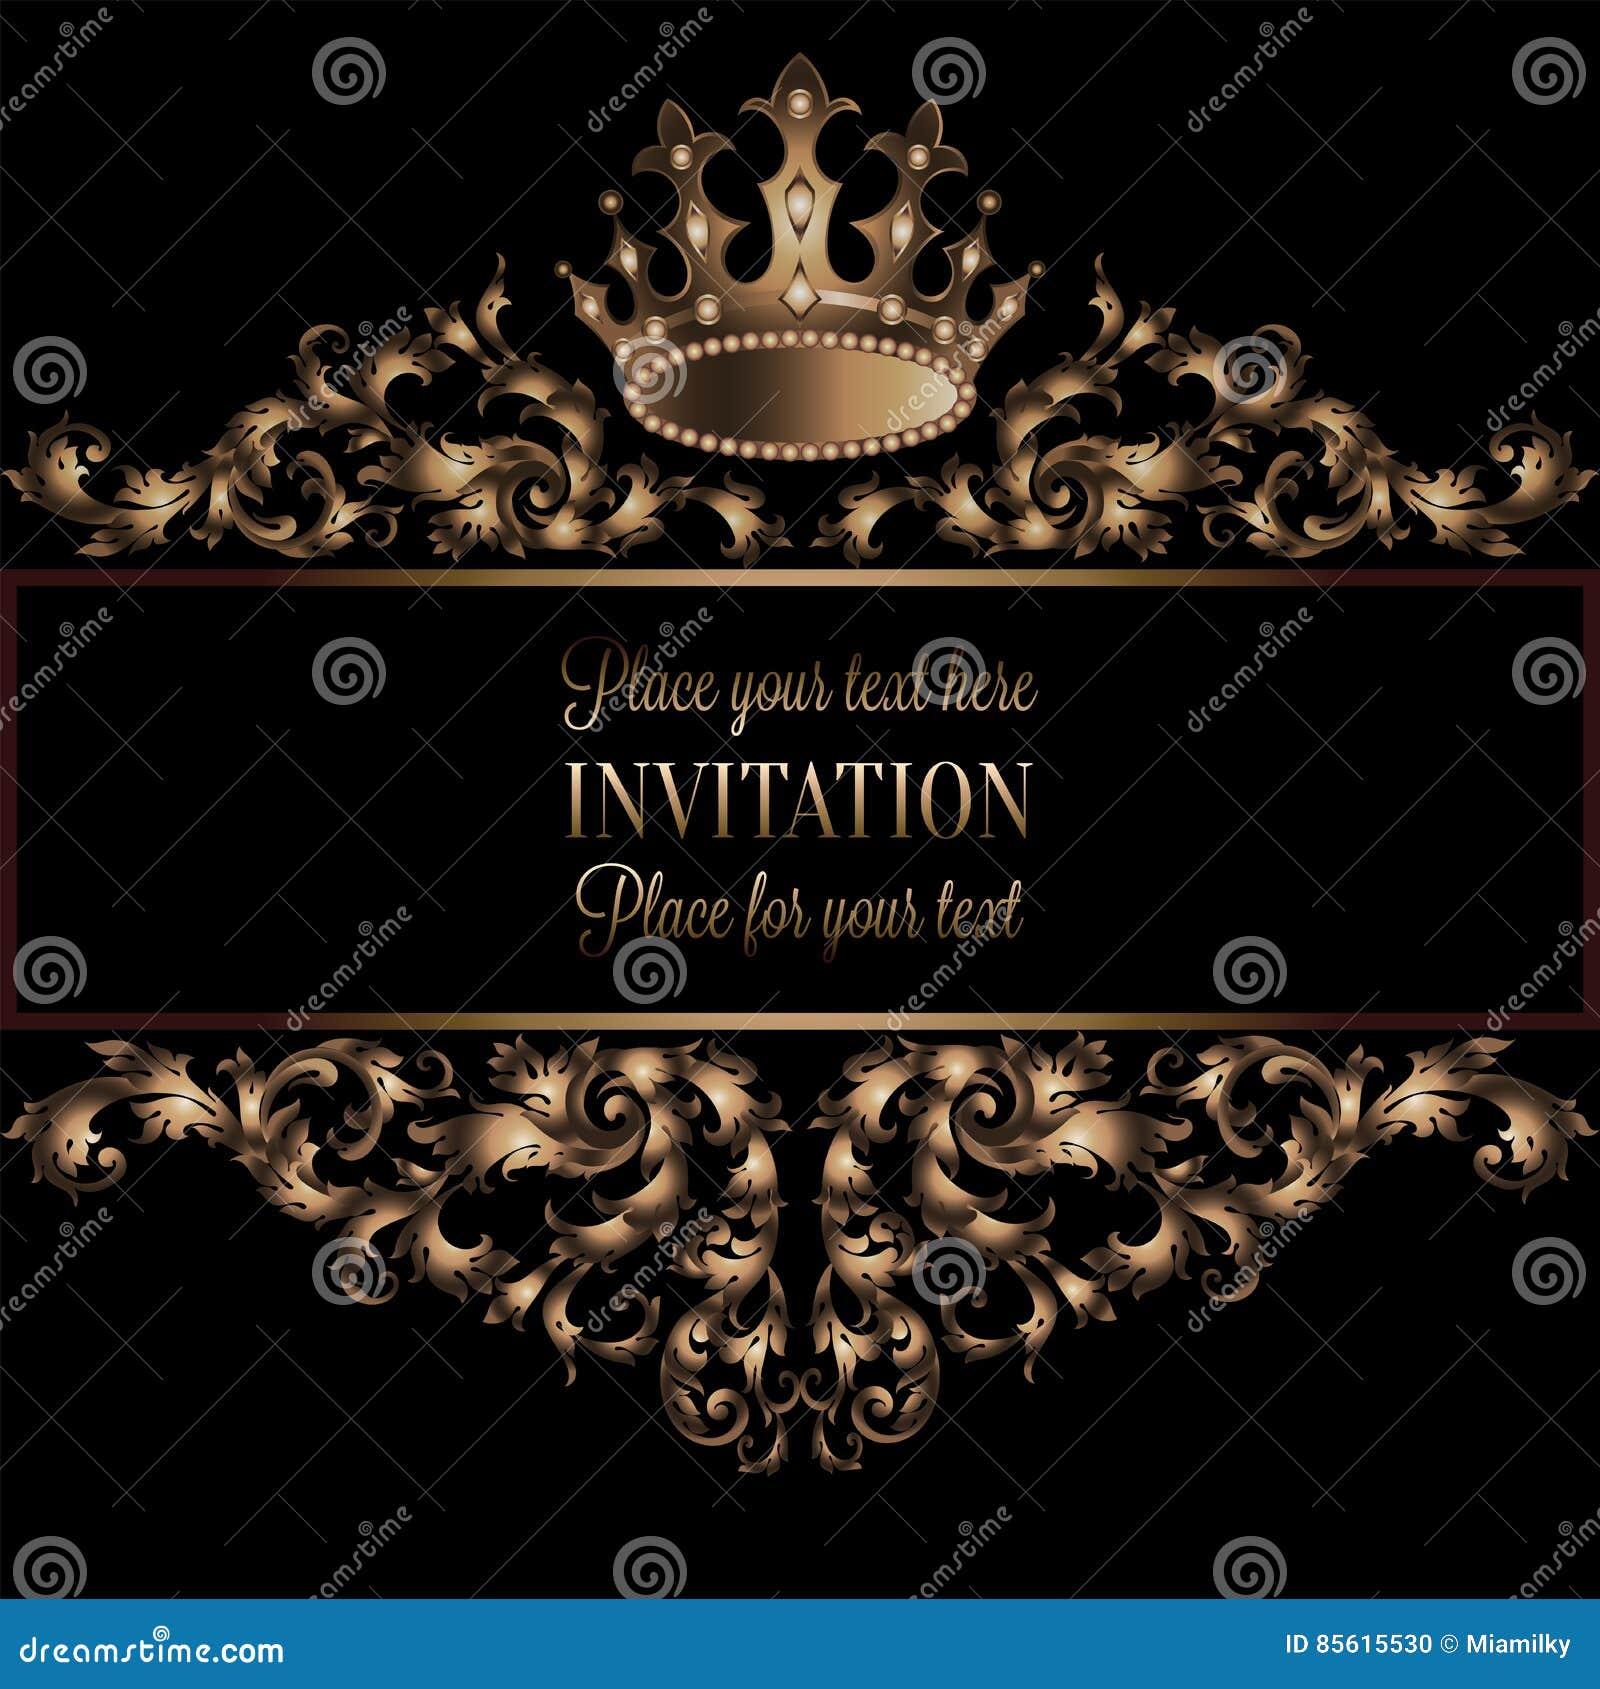 Vintage gold invitation card with black background divider header vintage gold invitation card with black background divider header ornamental lacy vector frame stopboris Choice Image